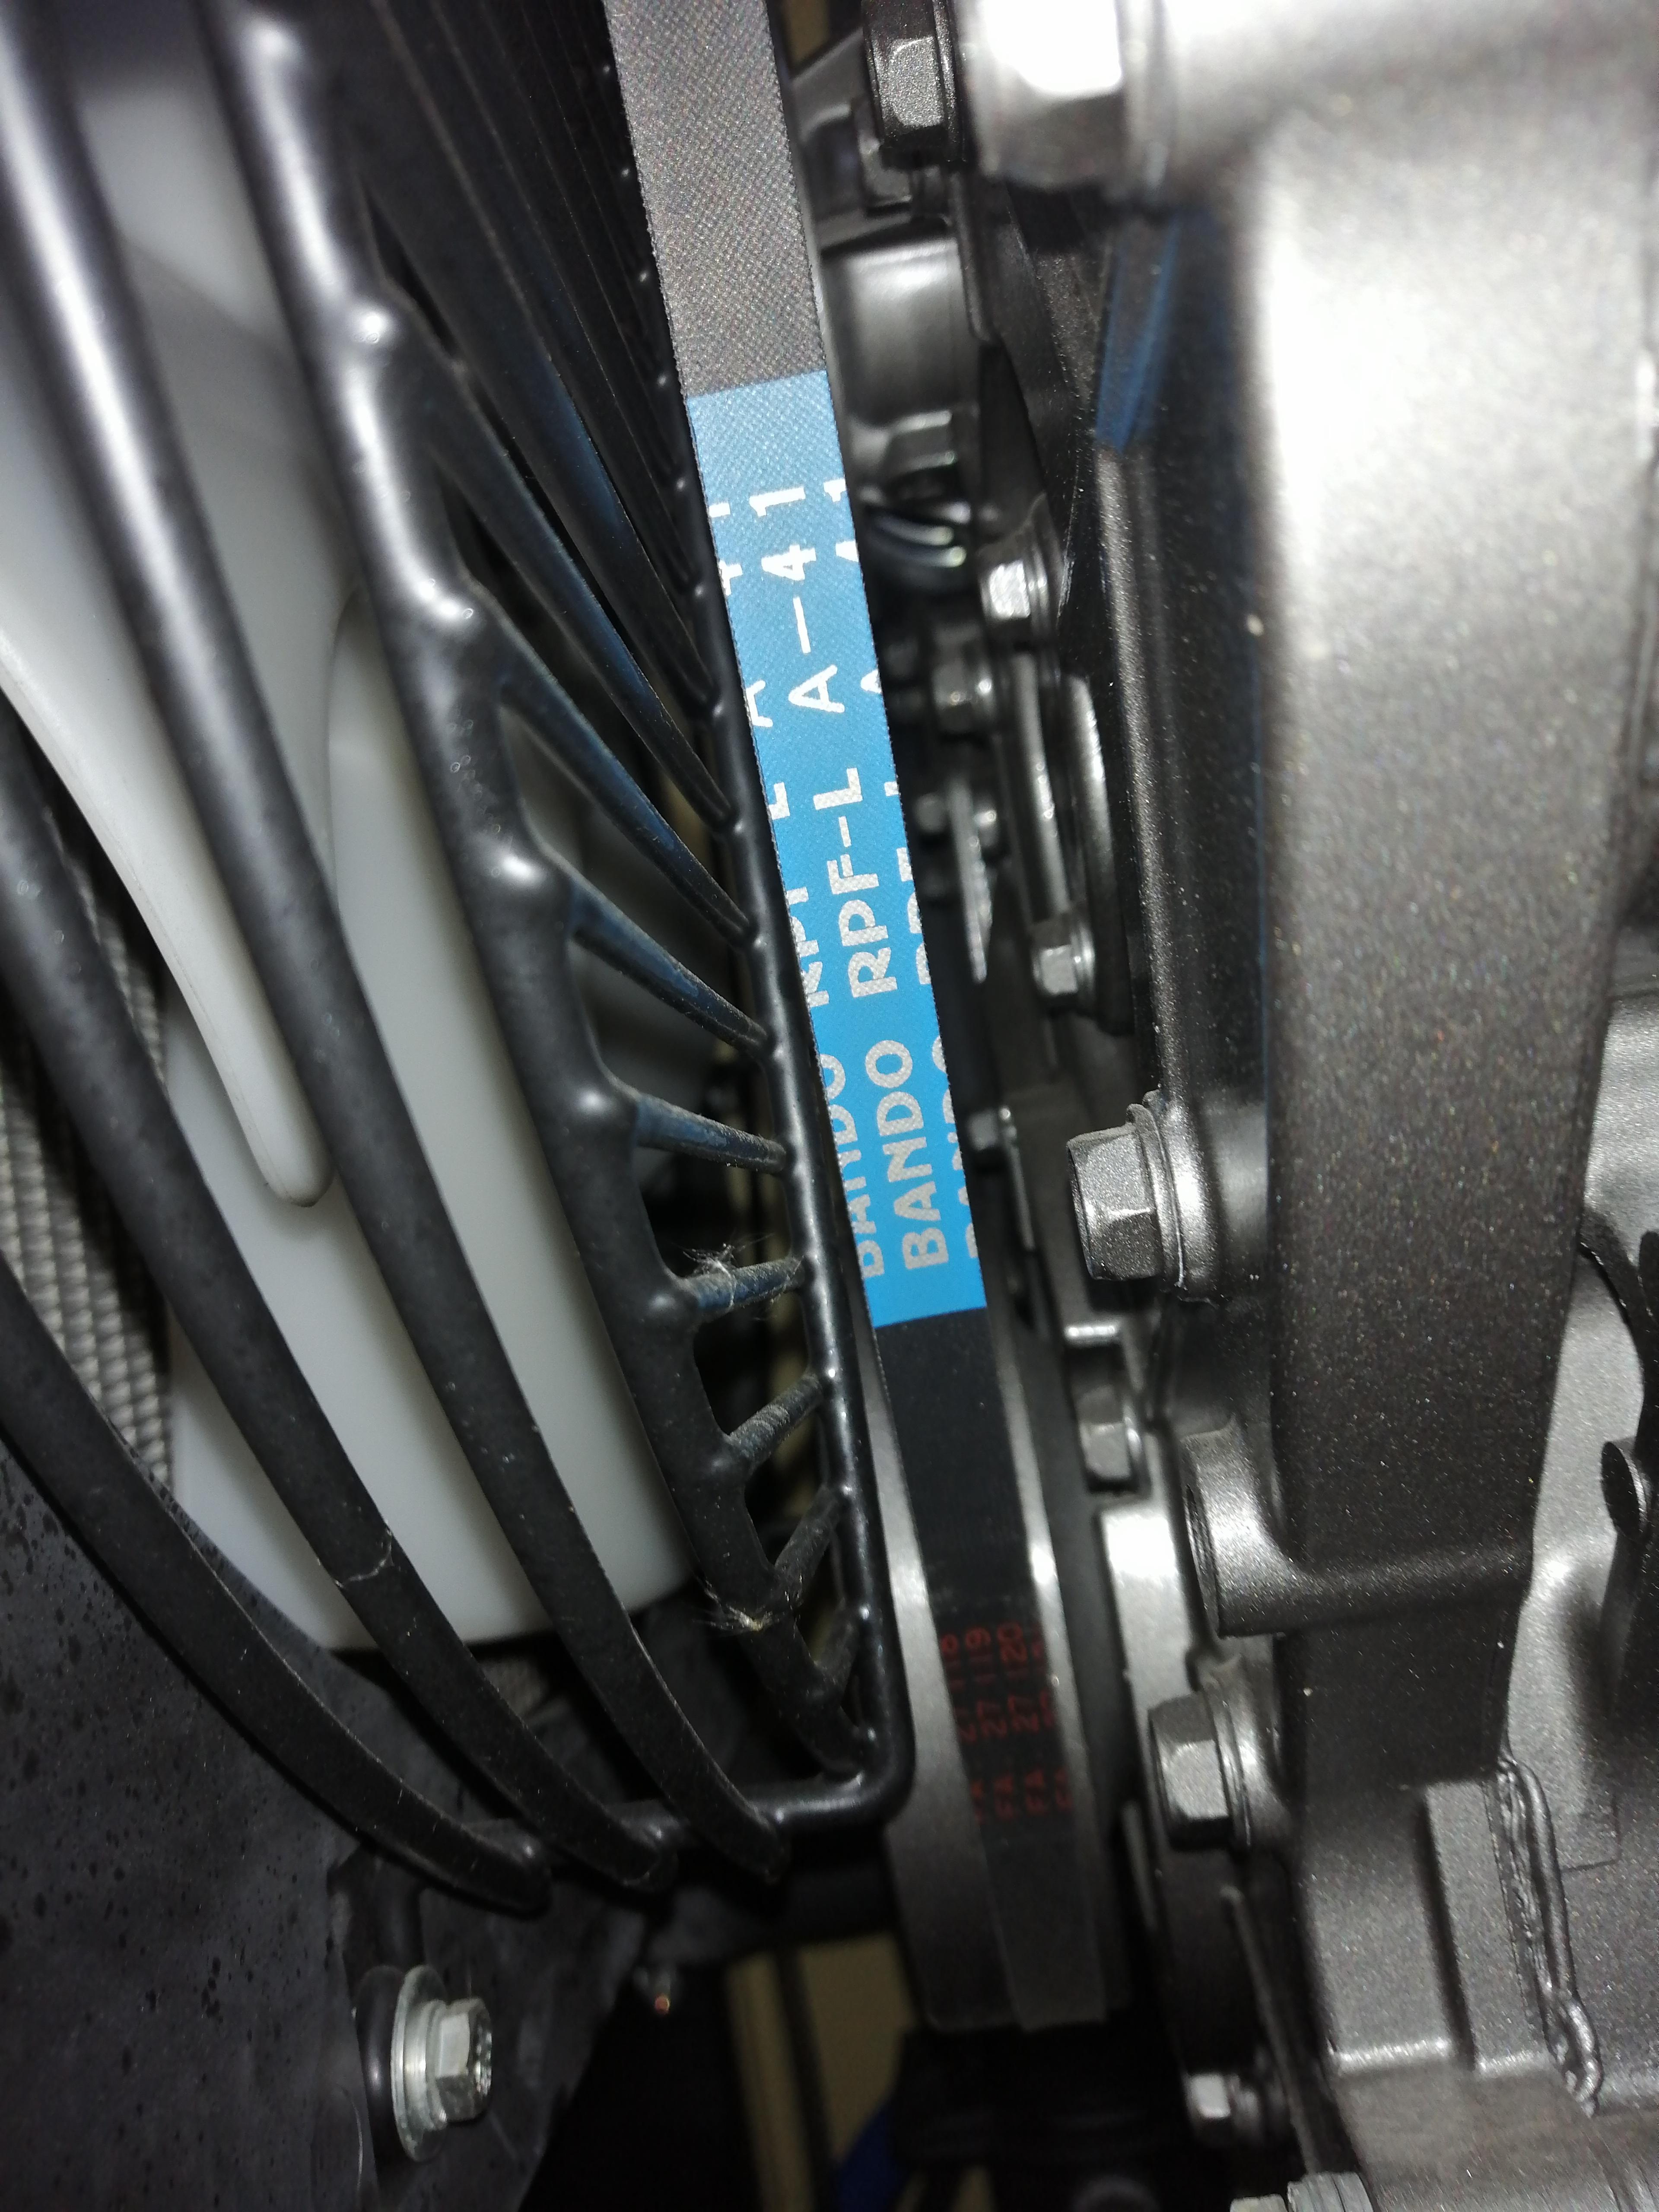 Ремень вентилятора Bando Rpf-l a-41